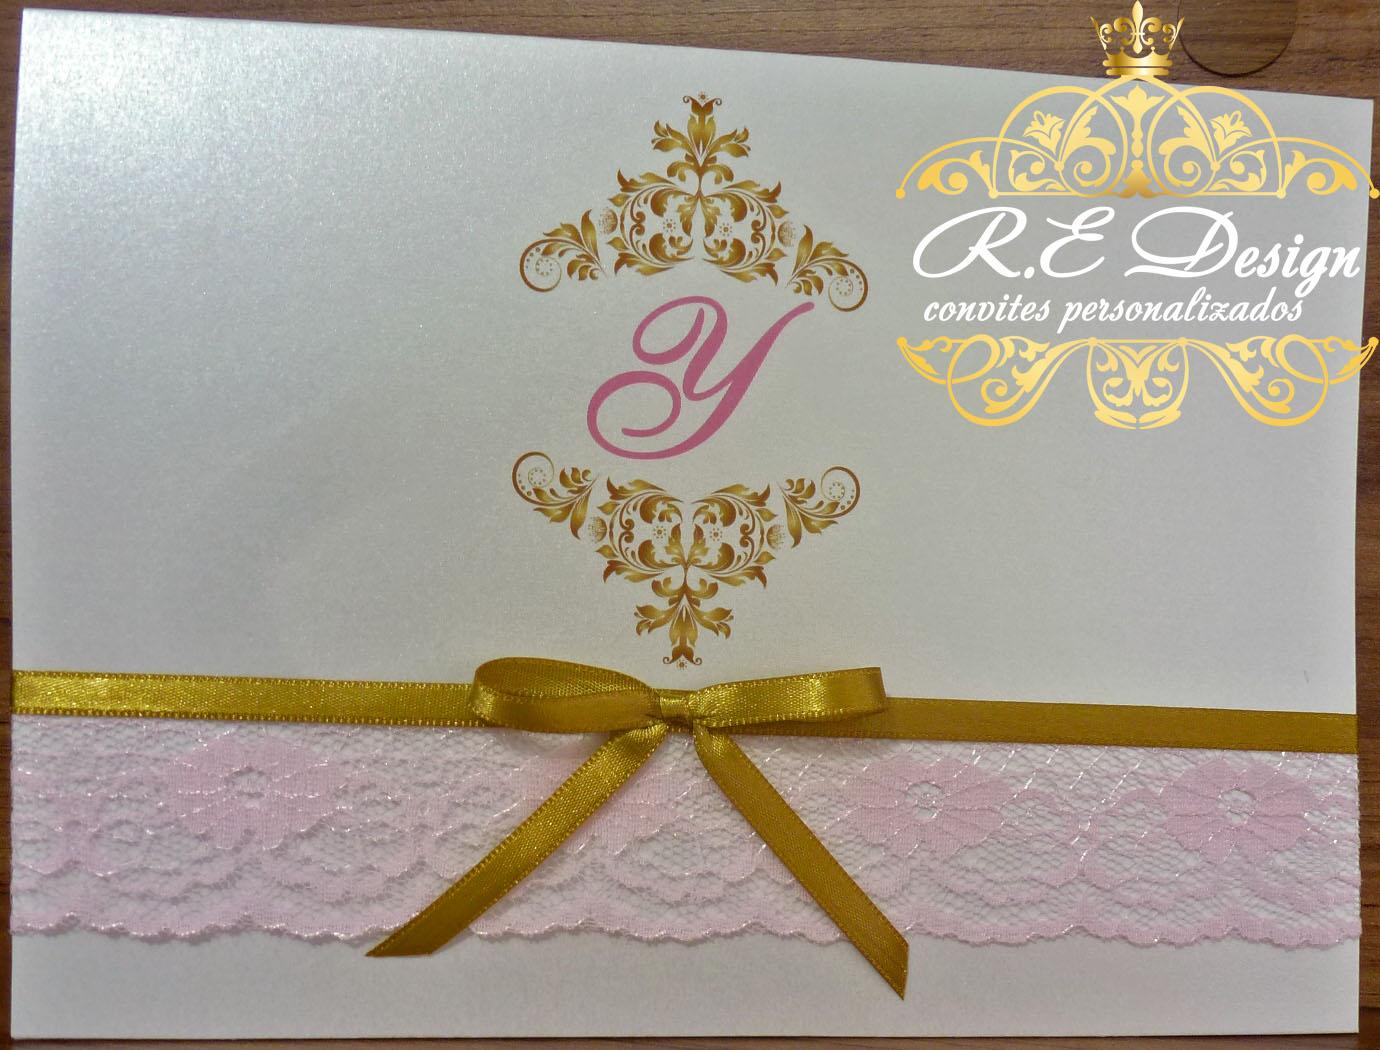 Convite para 15 anos no Elo7 | R.E Design Convites Personalizados (420C3C)